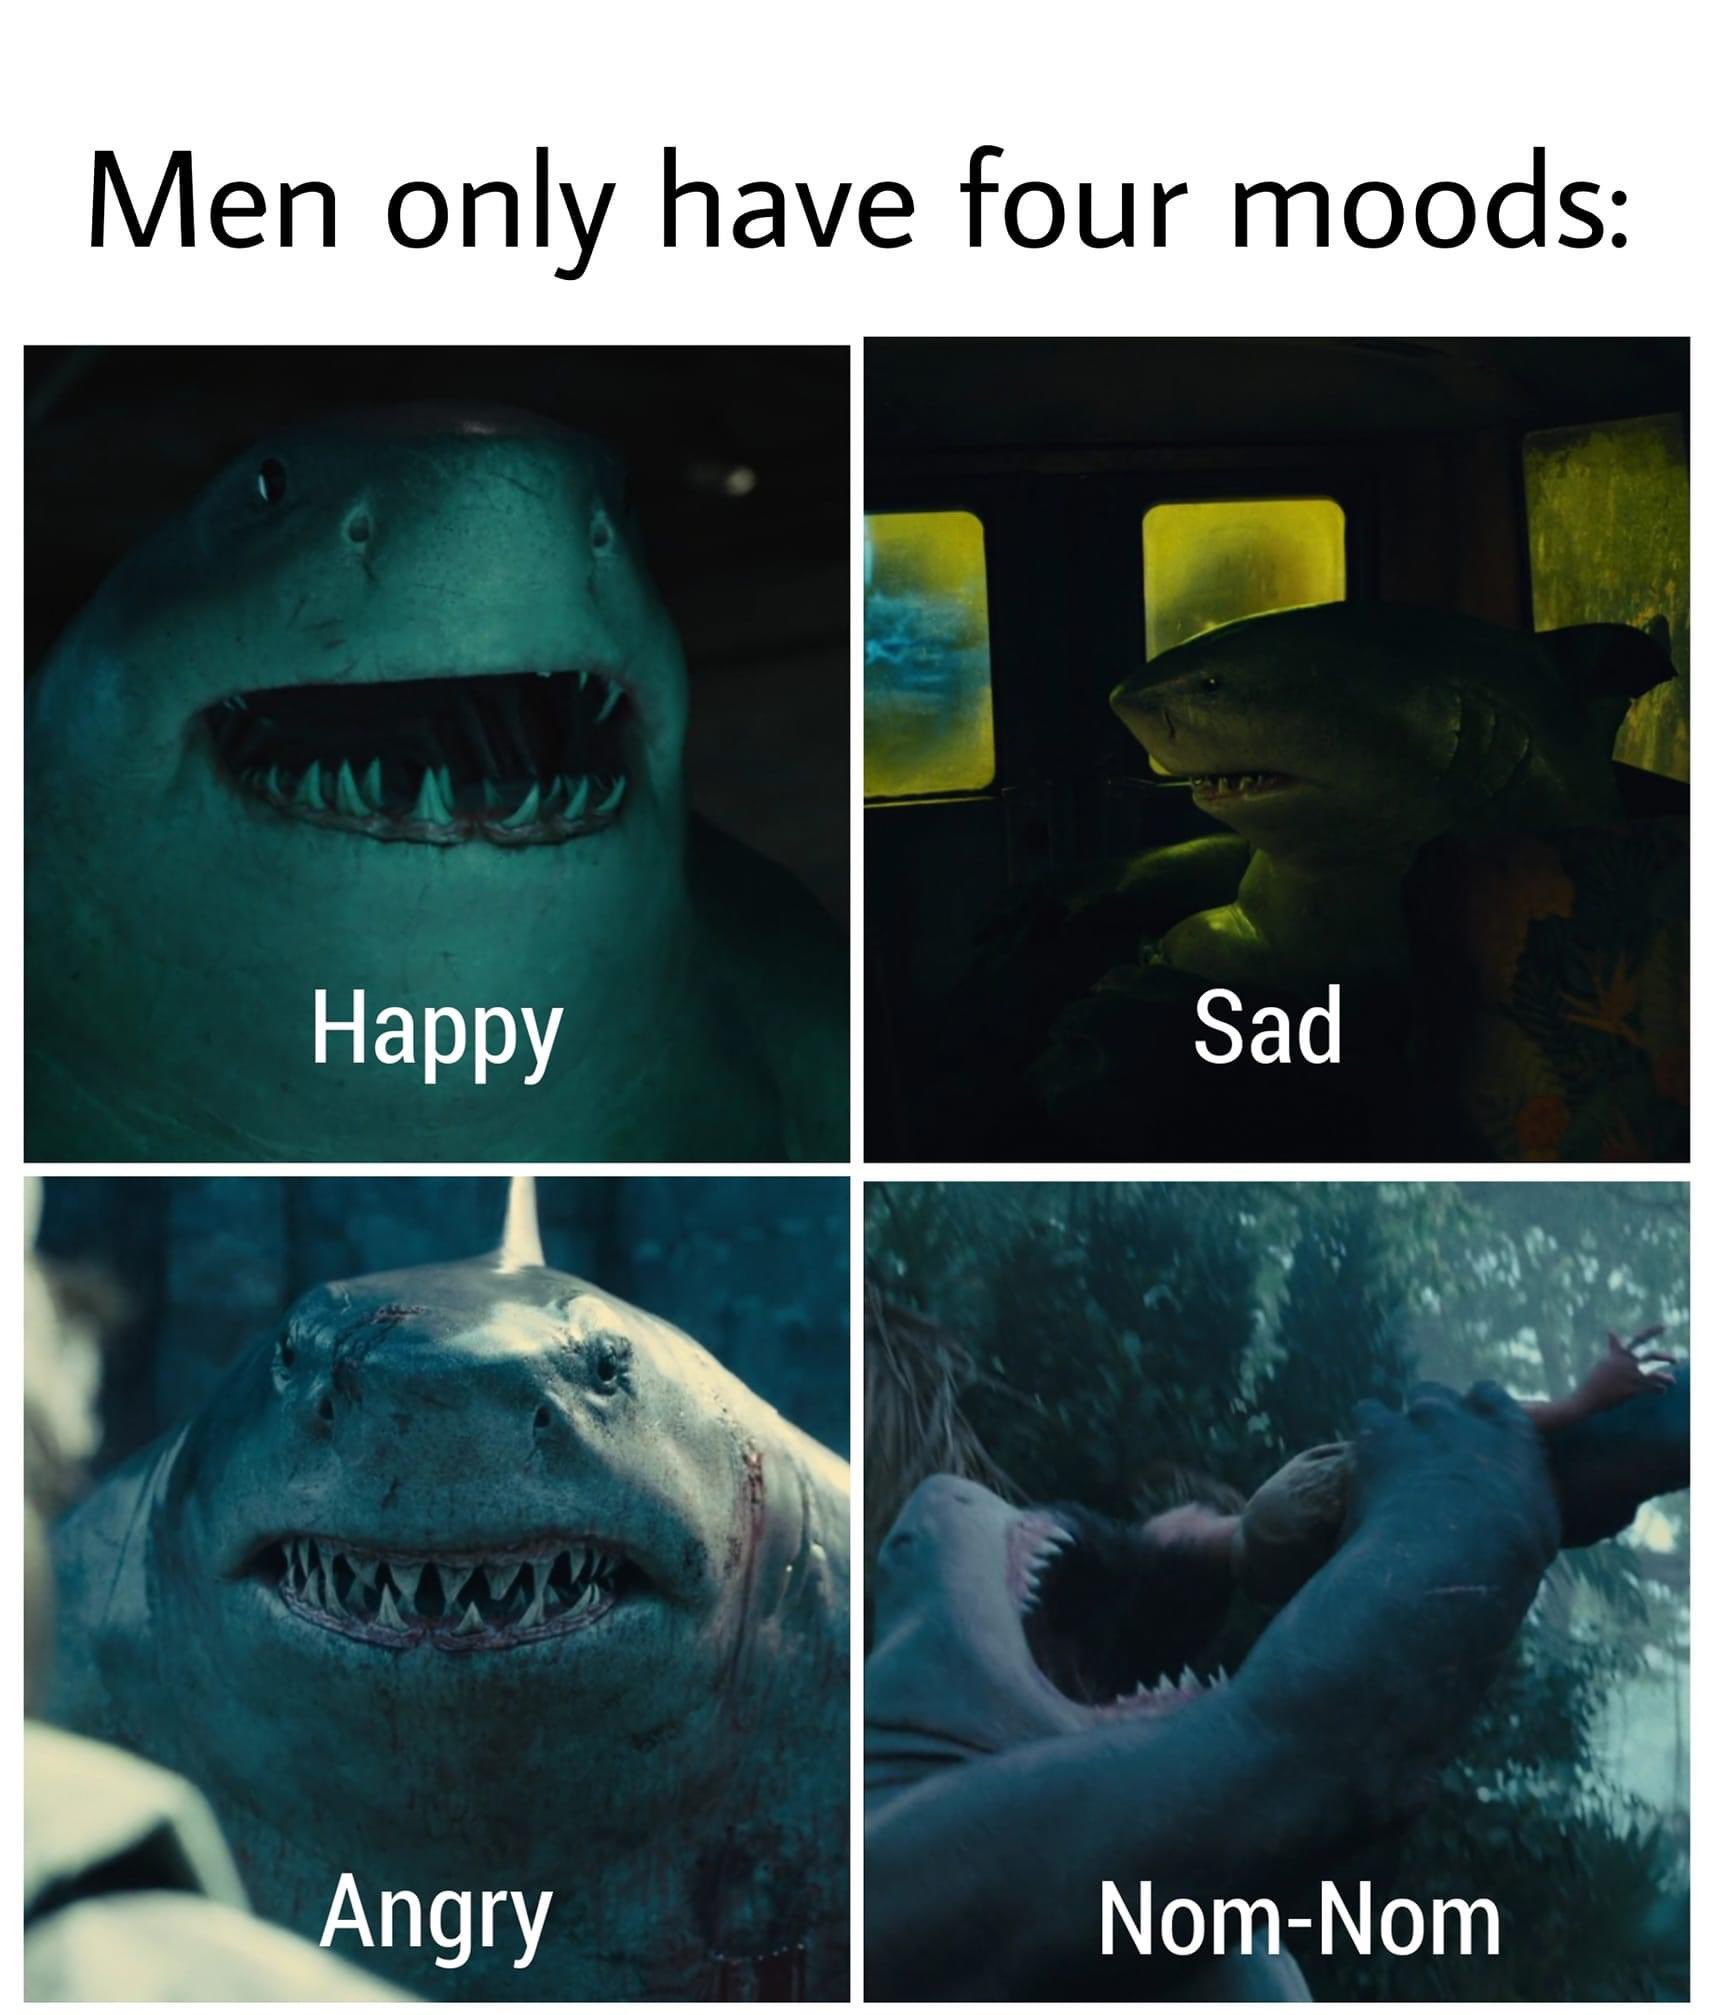 NOM NOM is a mood